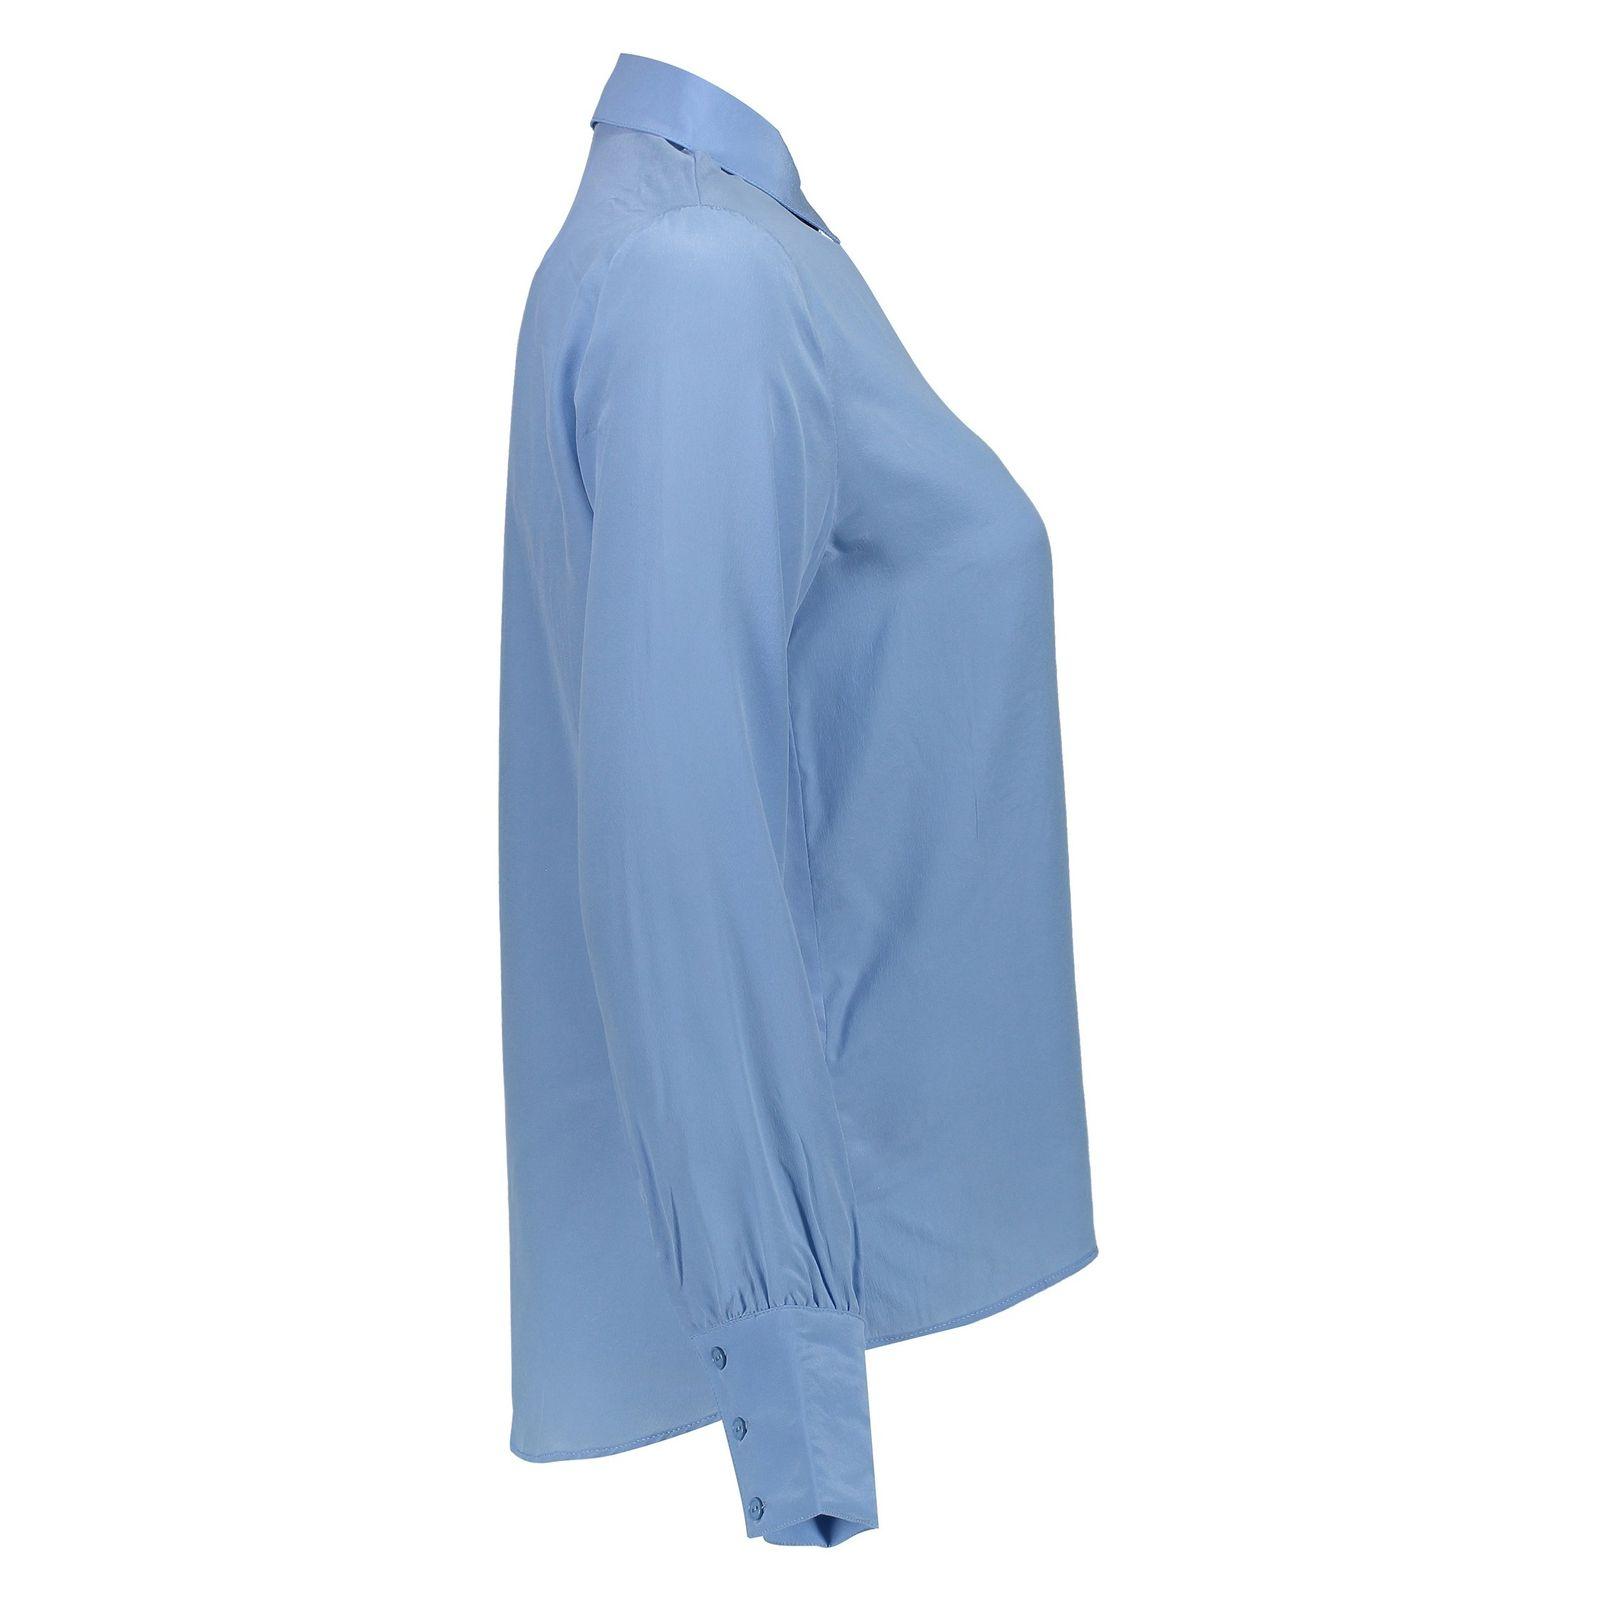 شومیز ابریشم آستین بلند زنانه - مینیموم - آبي - 4